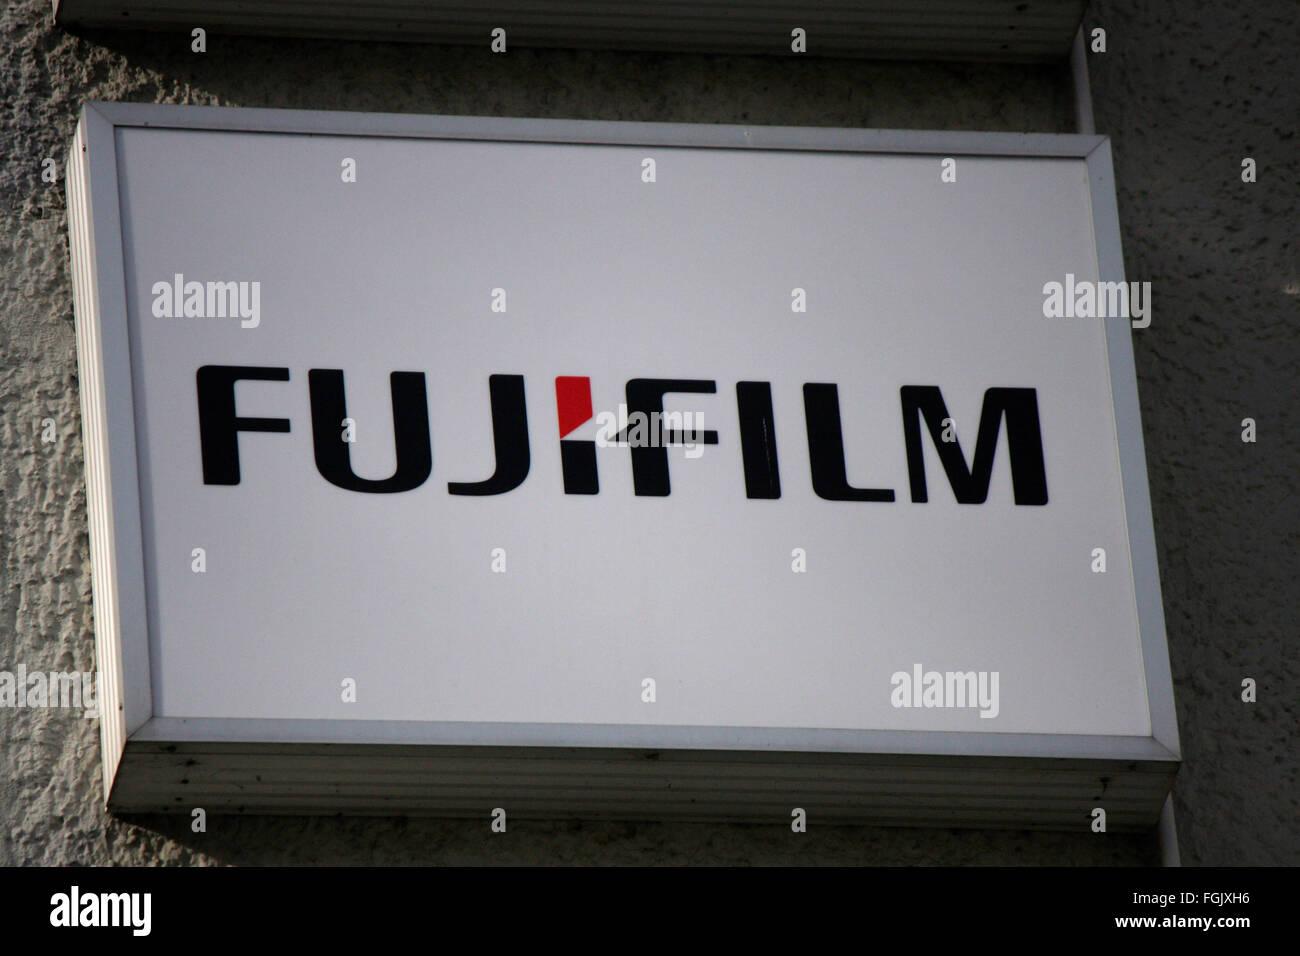 Markenname: 'Fujifilm', Berlin. - Stock Image